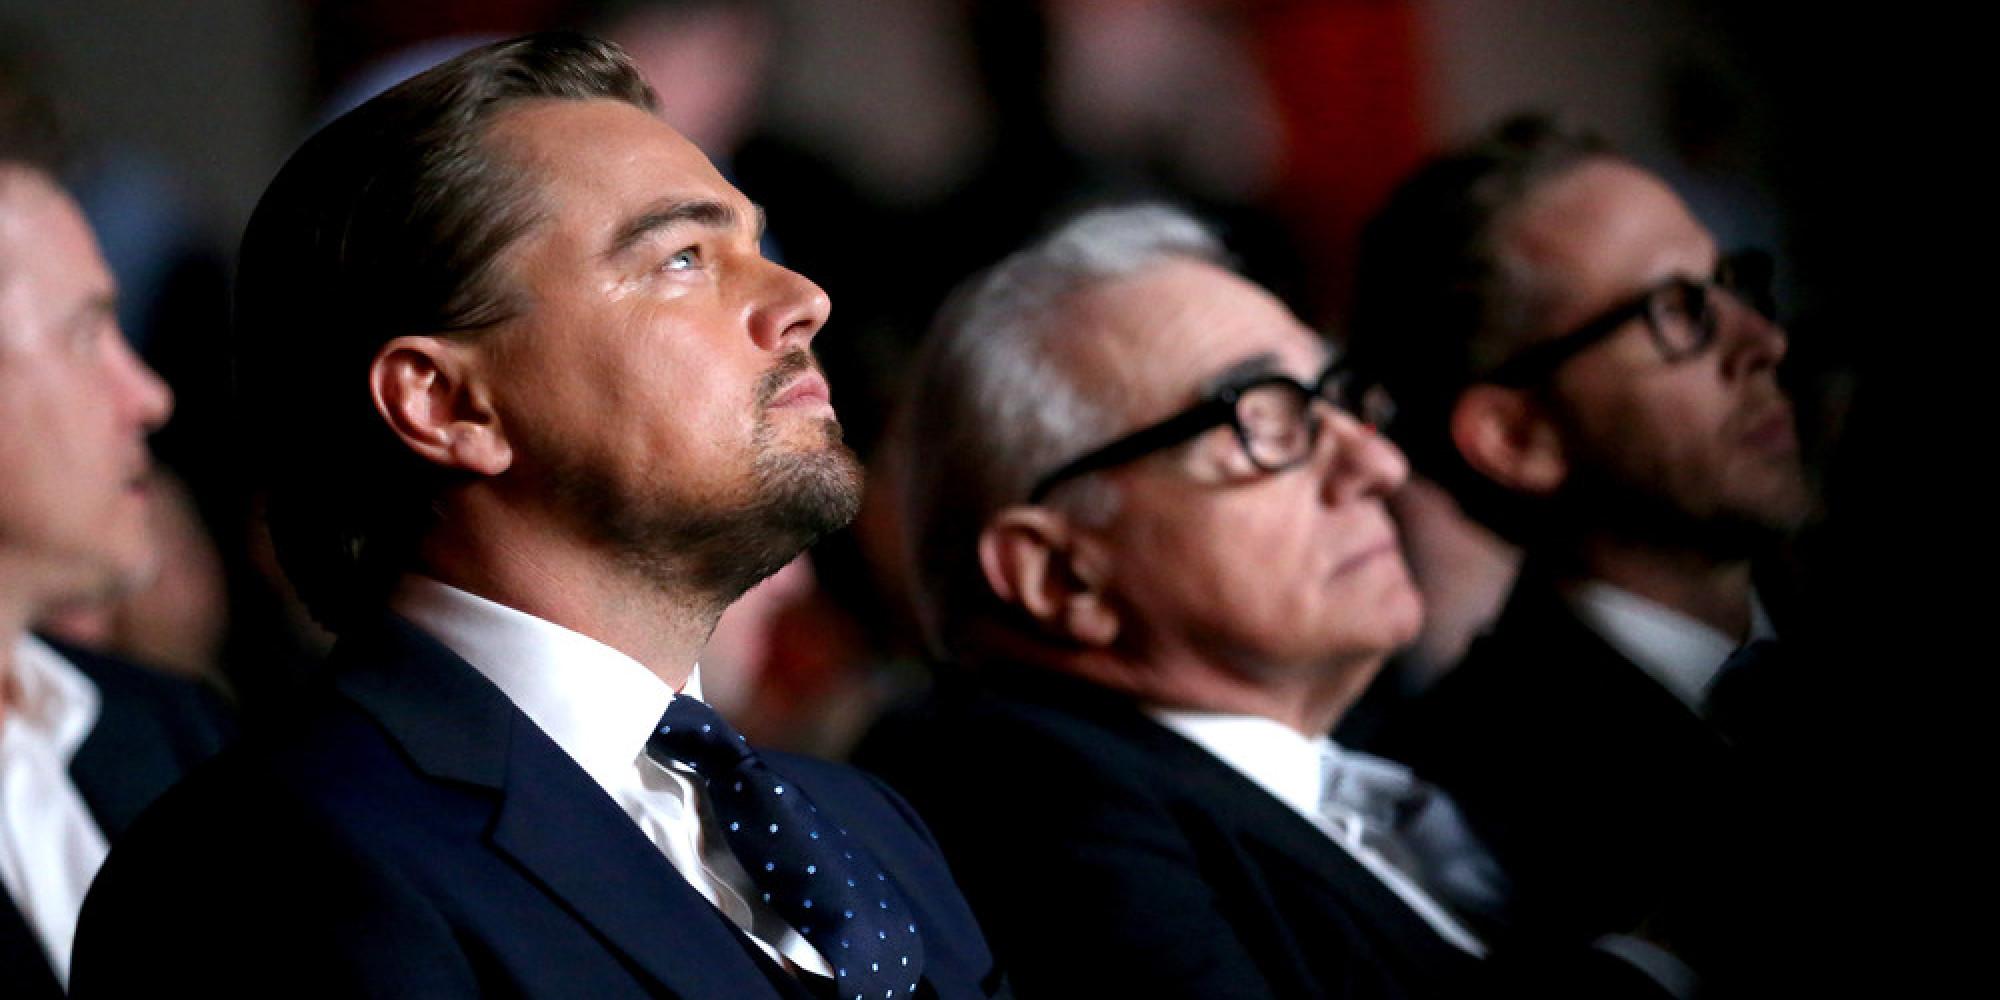 29th Santa Barbara International Film Festival - Cinema Vanguard to Martin Scorsese and Leonardo DiCaprio